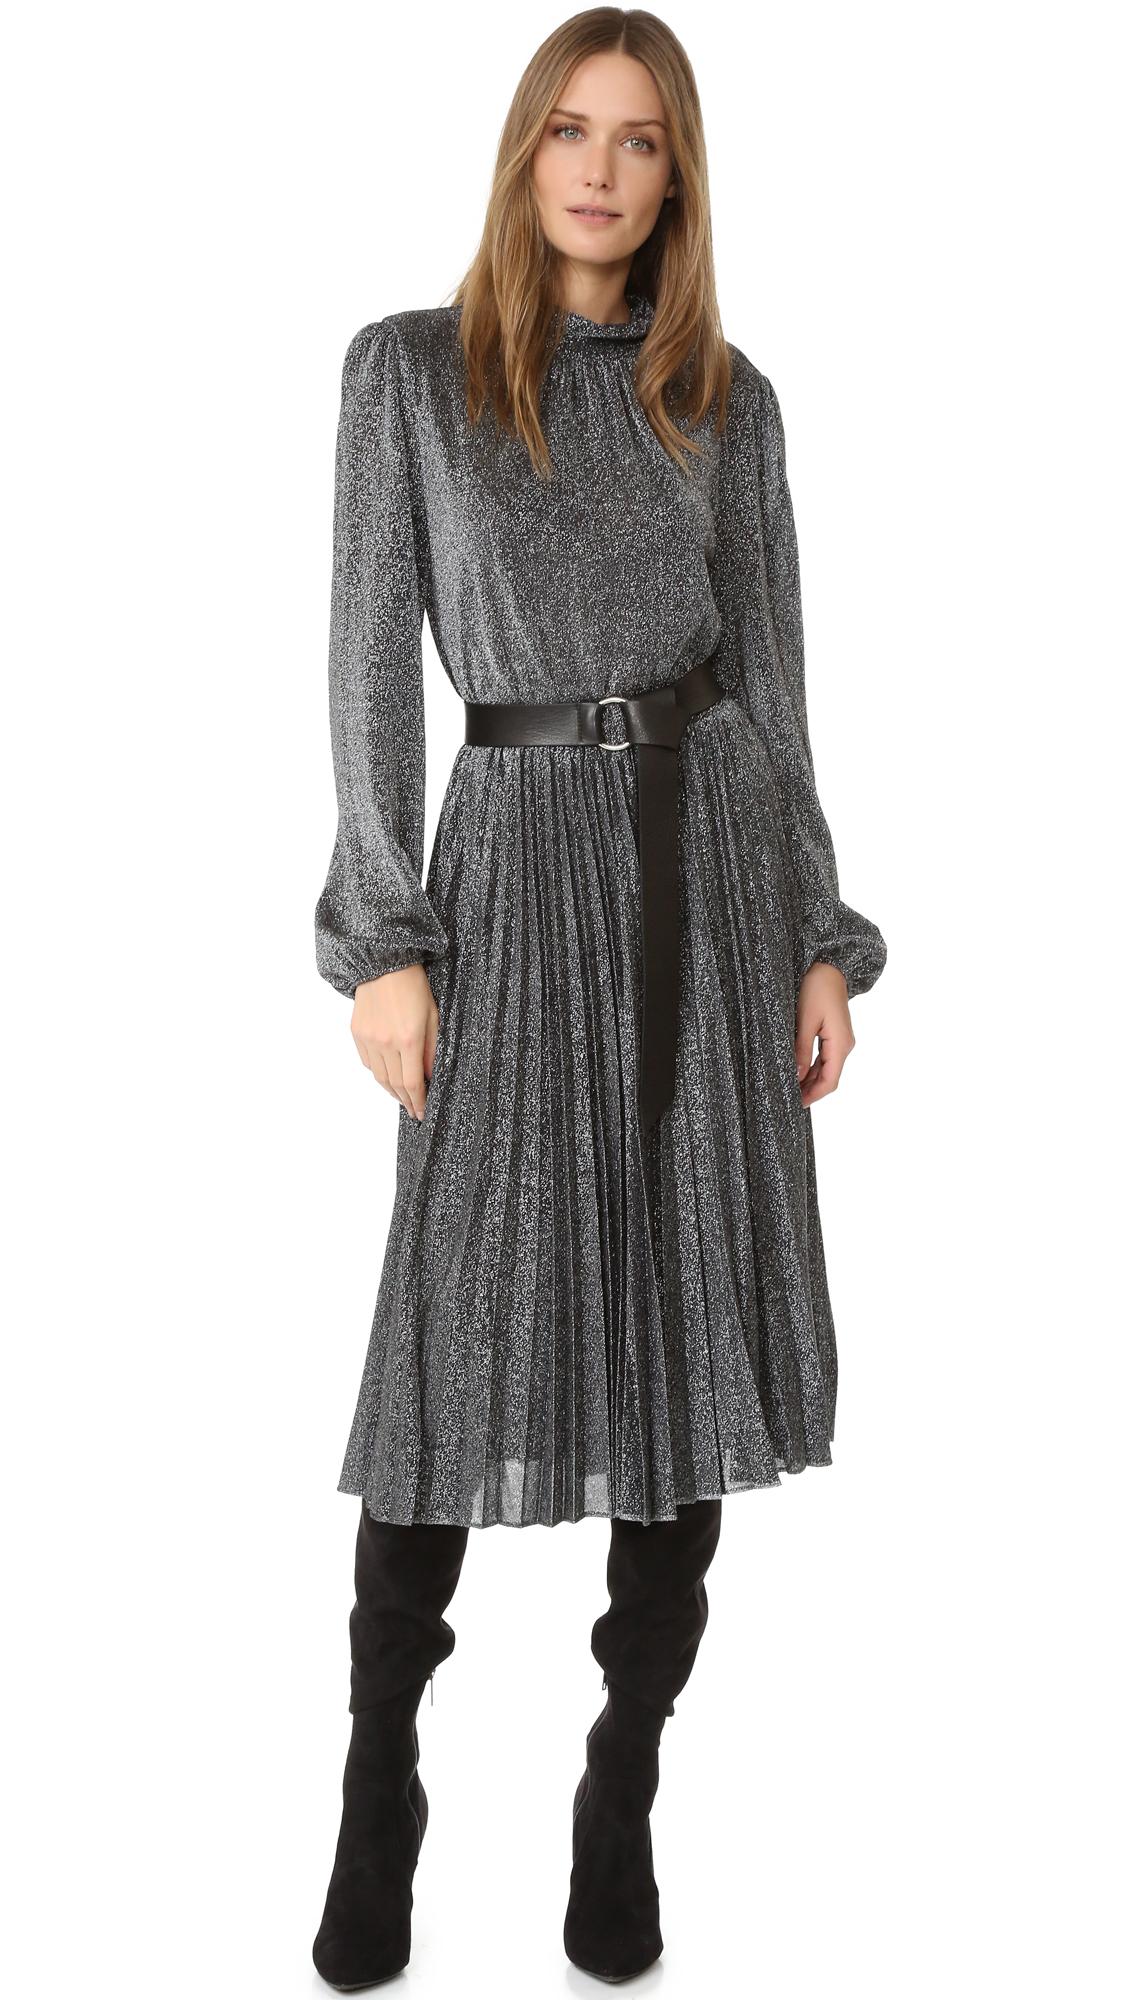 Bcbgmaxazria Pleated Metallic Dress - Silver Black at Shopbop